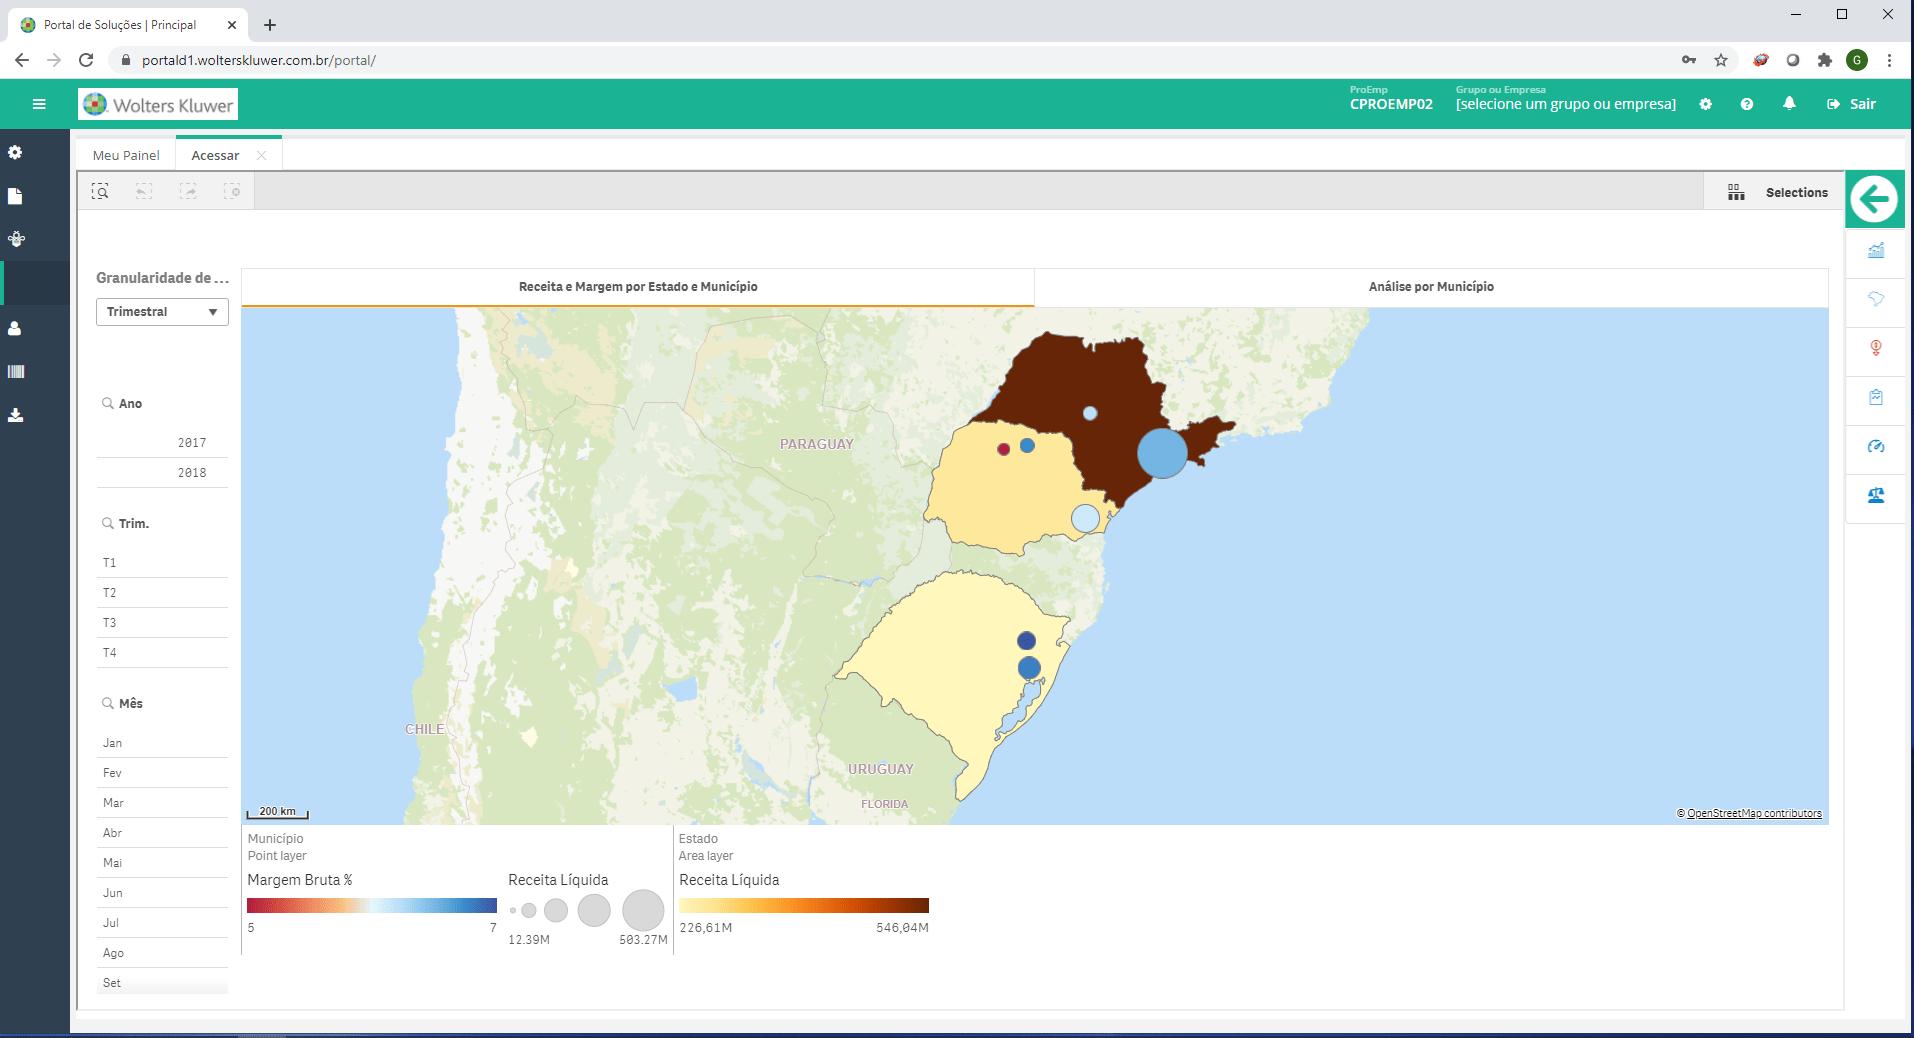 dash financeiro receita estado municipio Prosoft Analytics